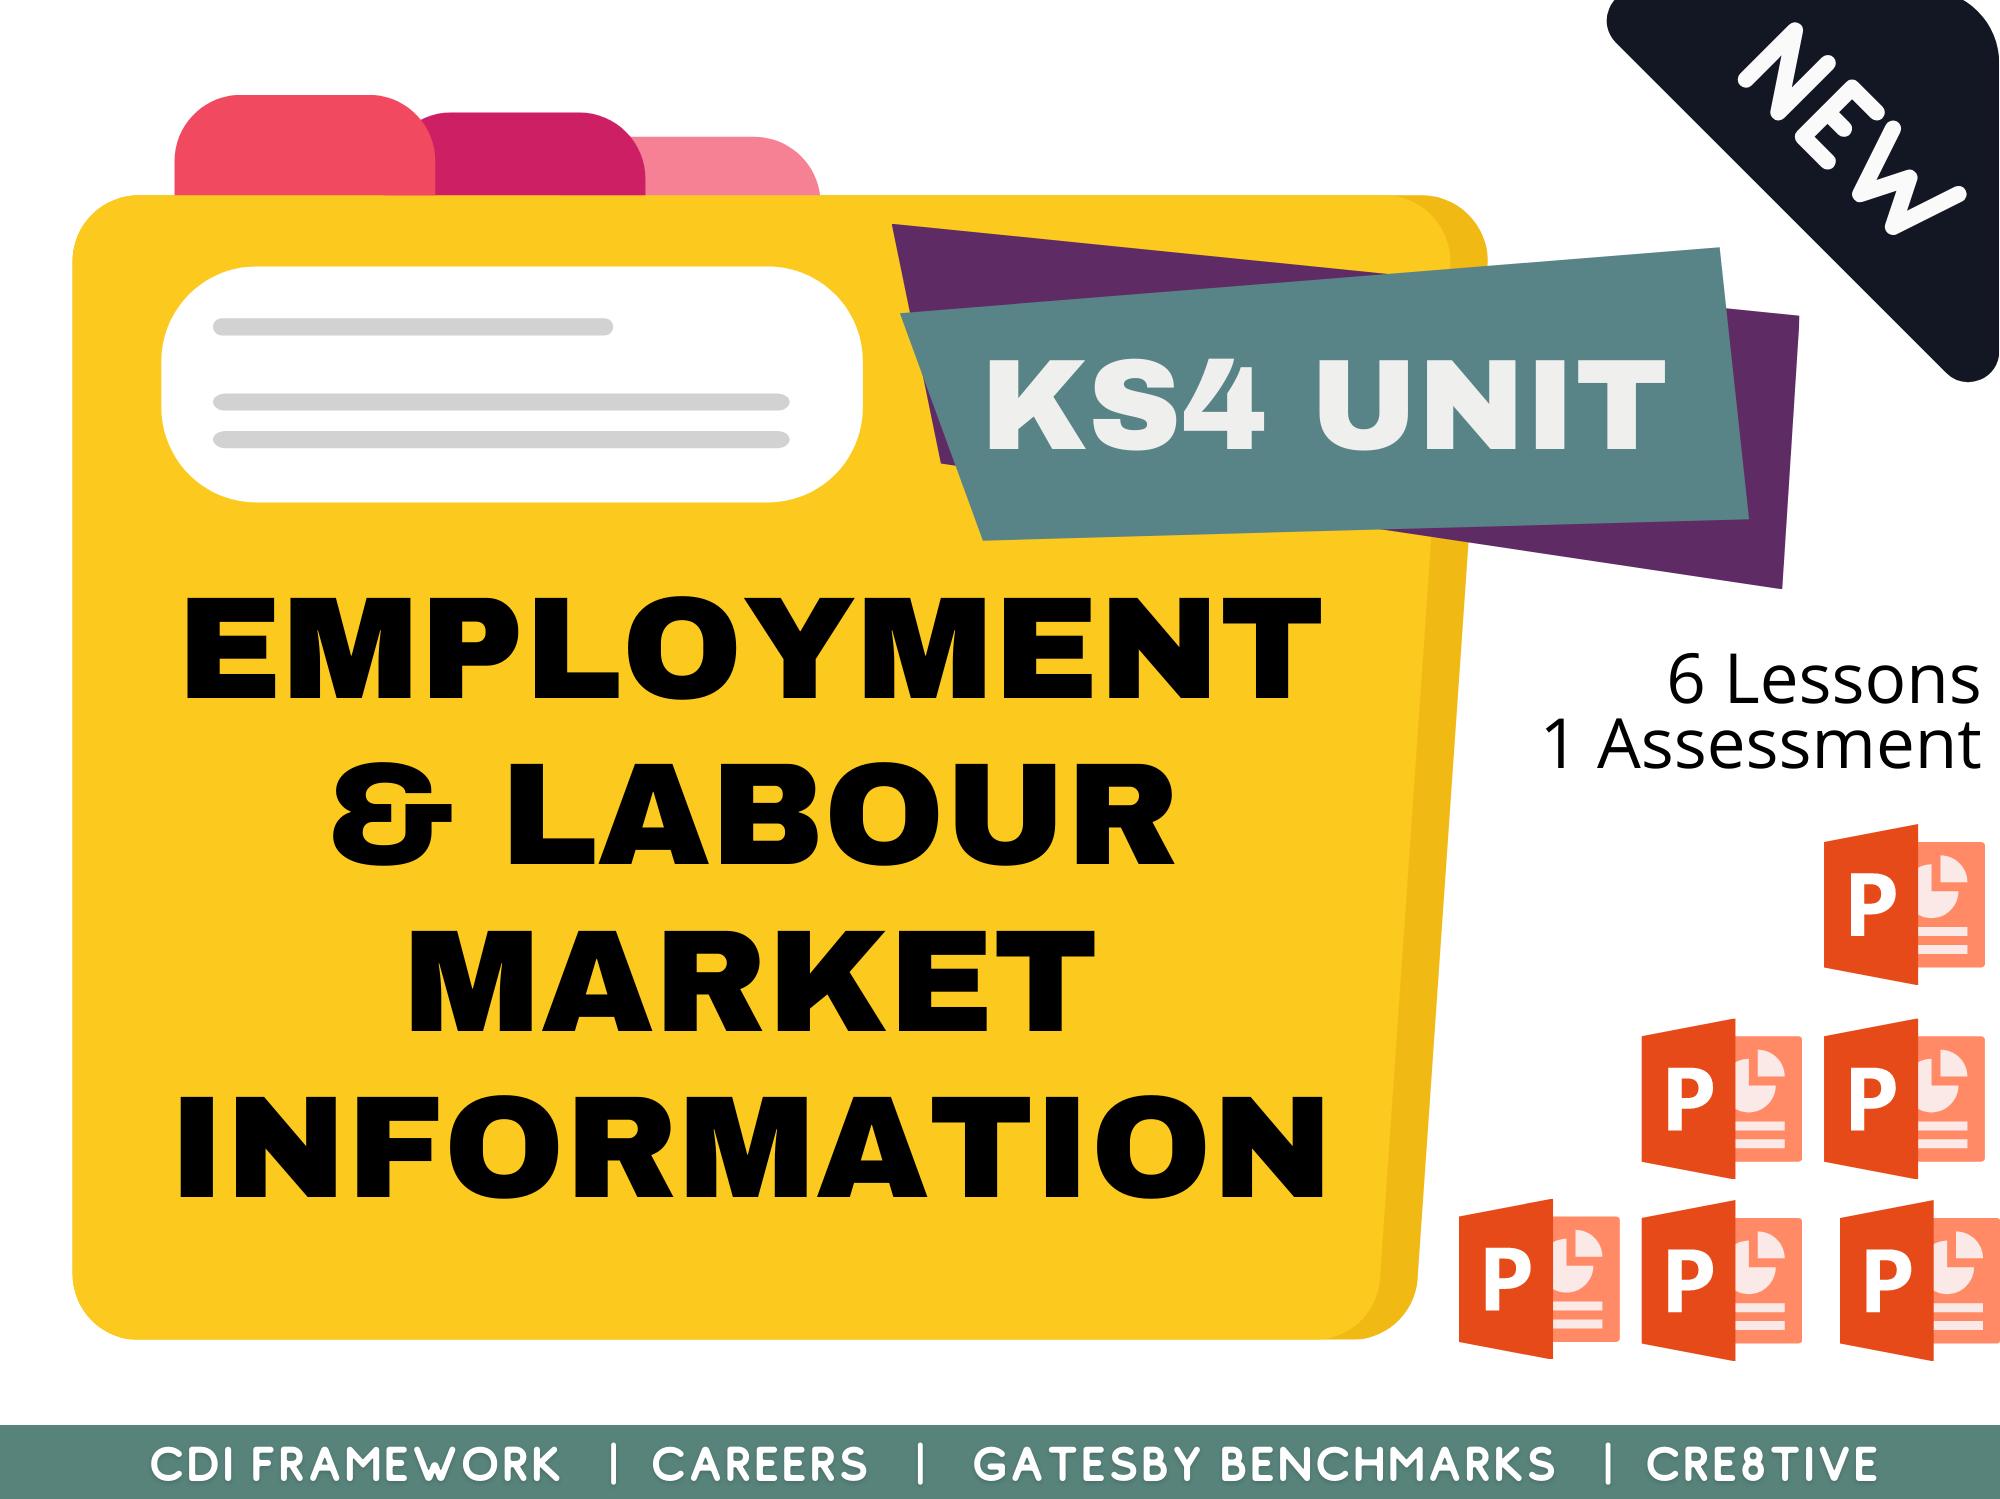 Employment and LMI Unit